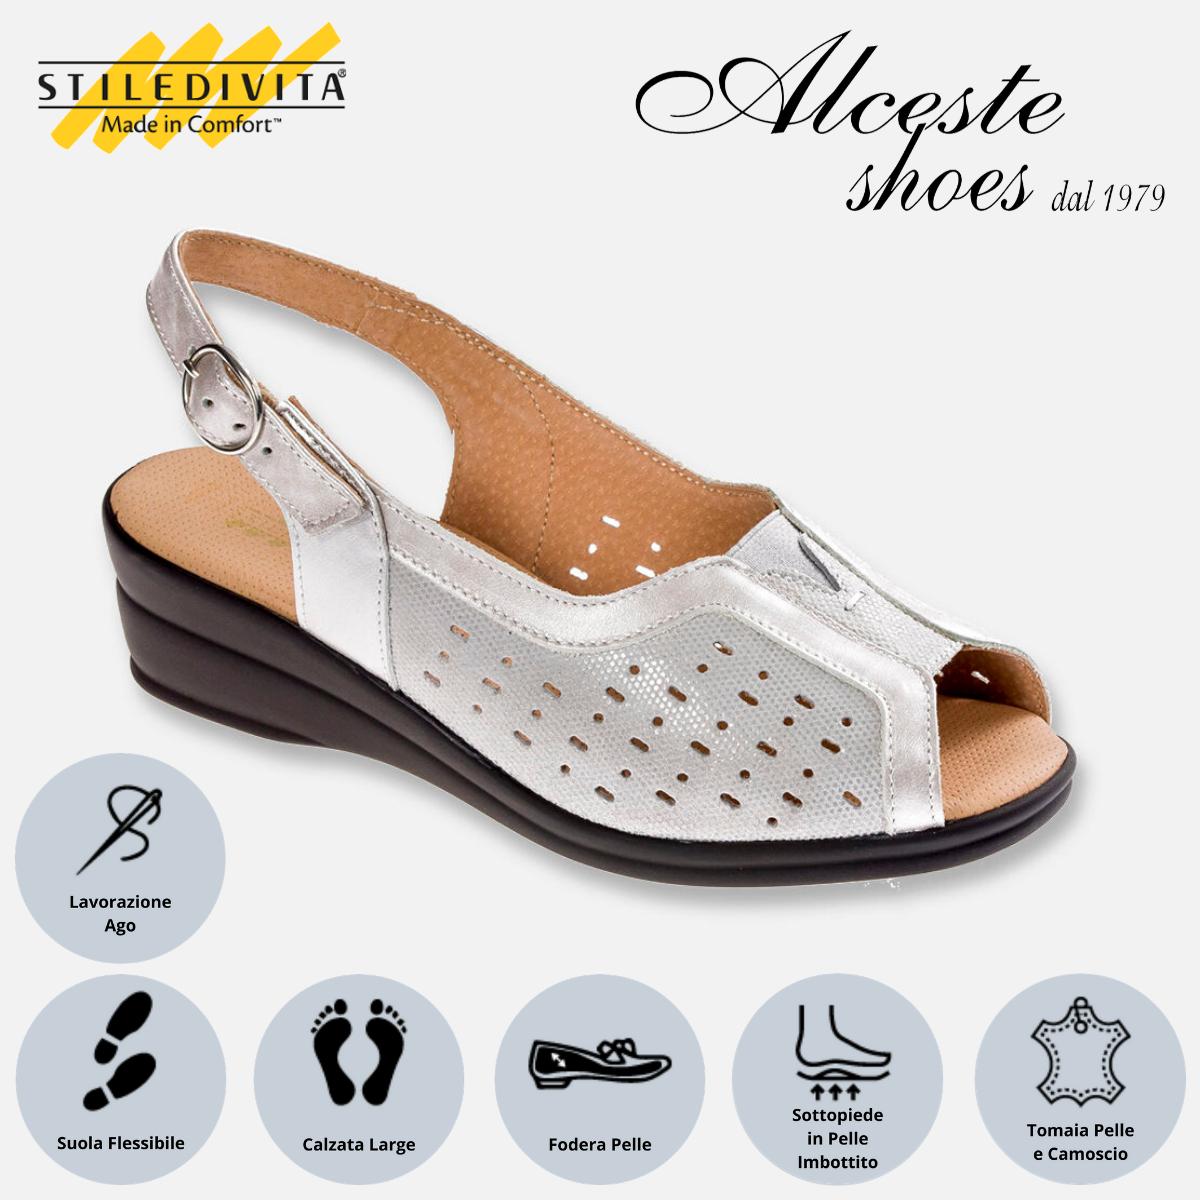 Sandalo Traforato Stiledivita Art. 4938 Camoscio e Pelle Argento Alceste Shoes 4938 Argento